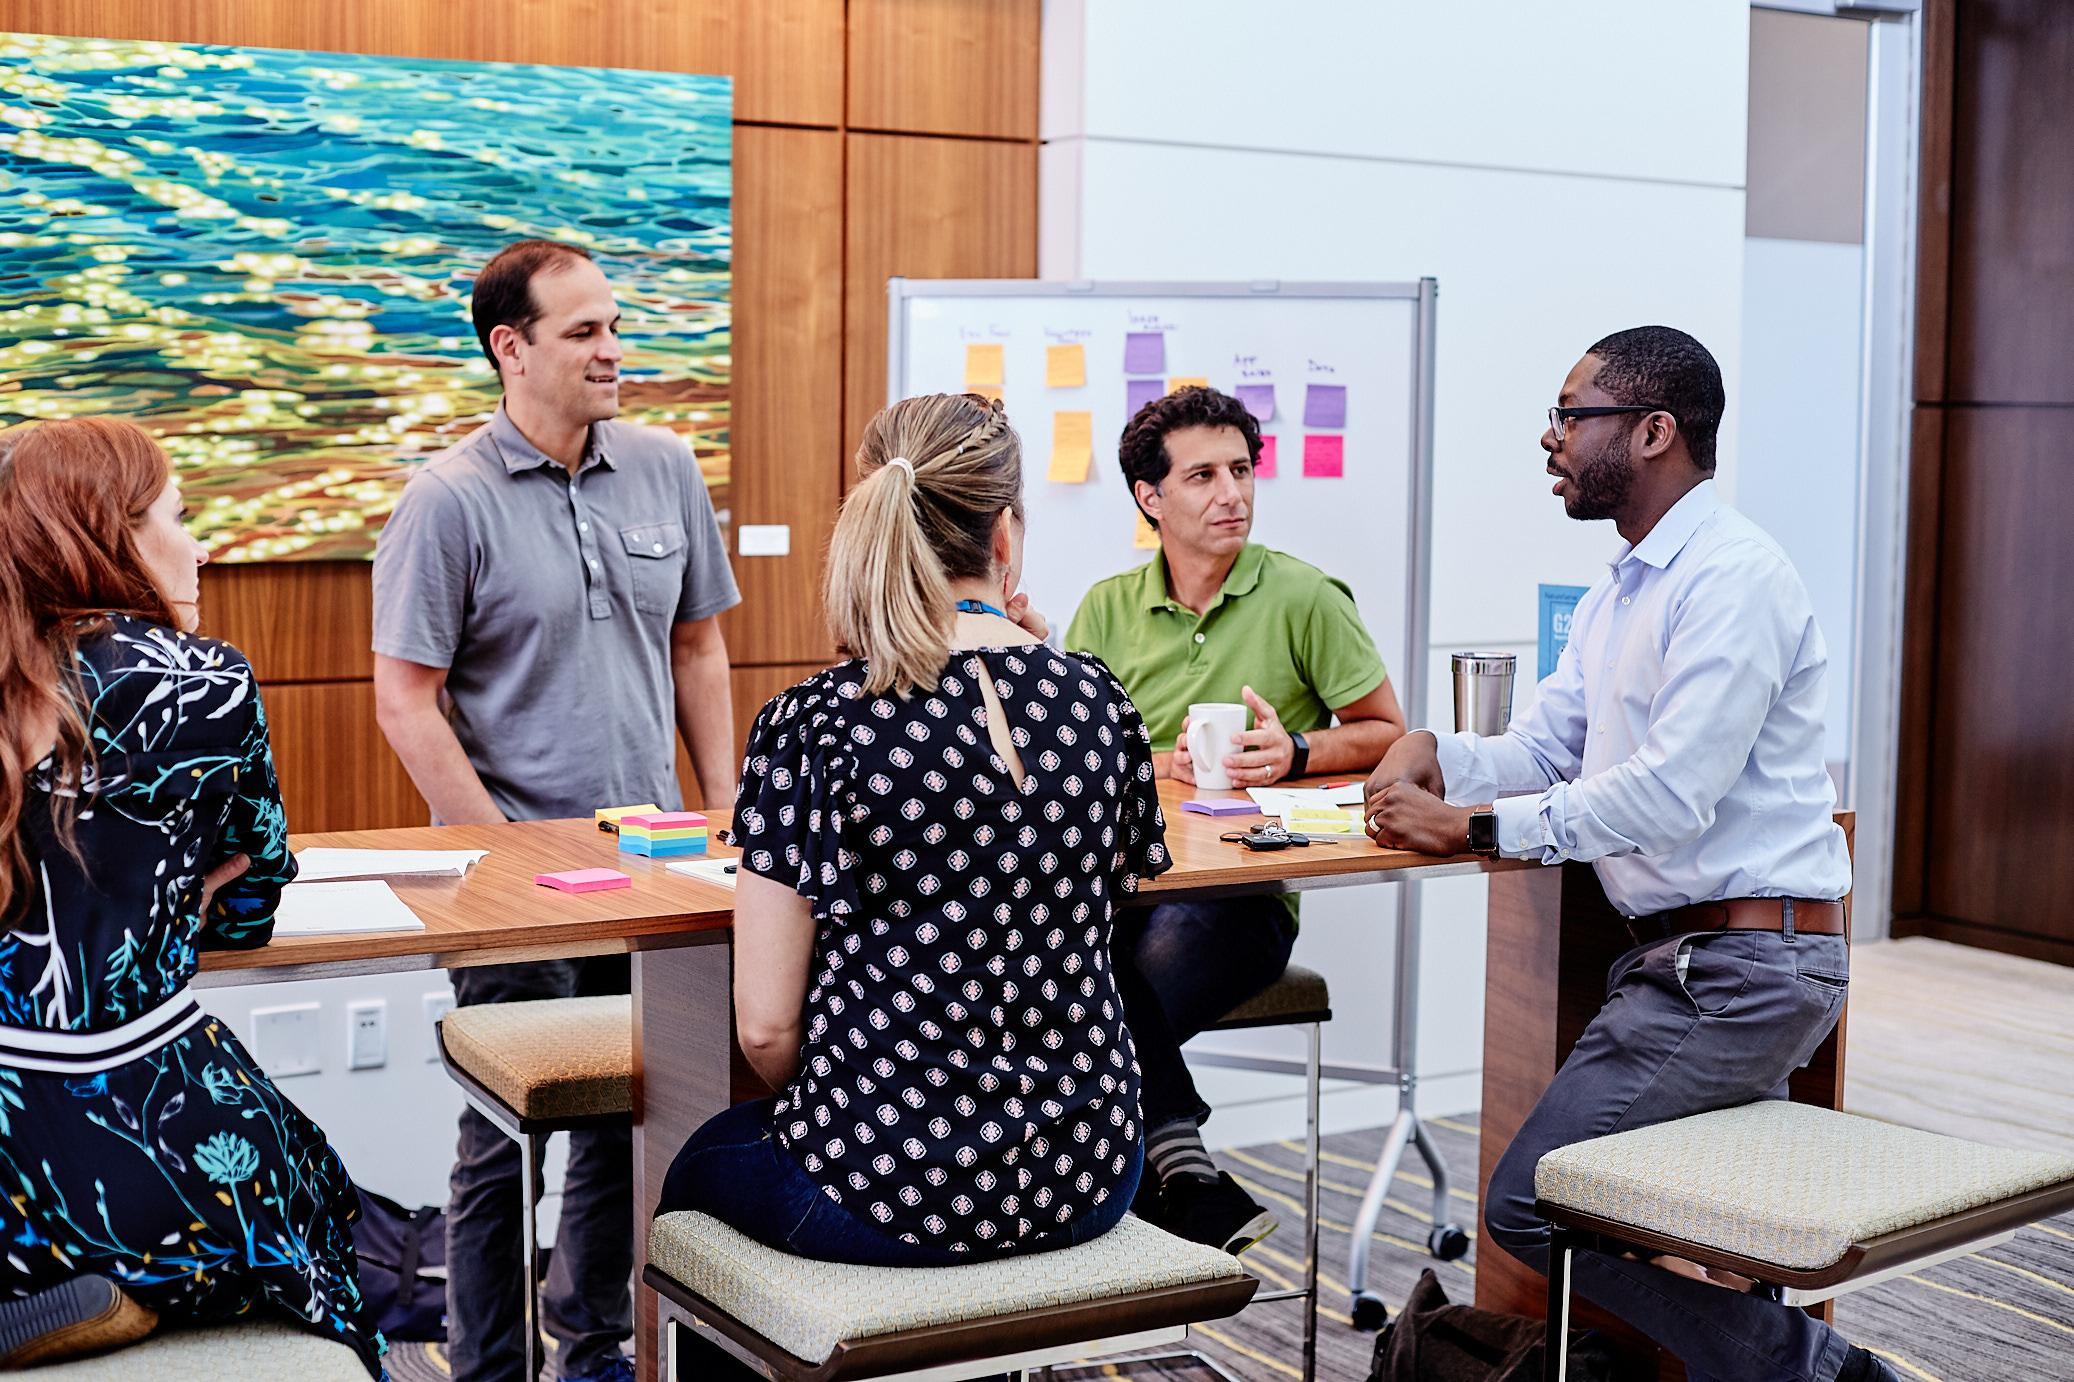 SAS employees converse at the Social Innovation Showcase